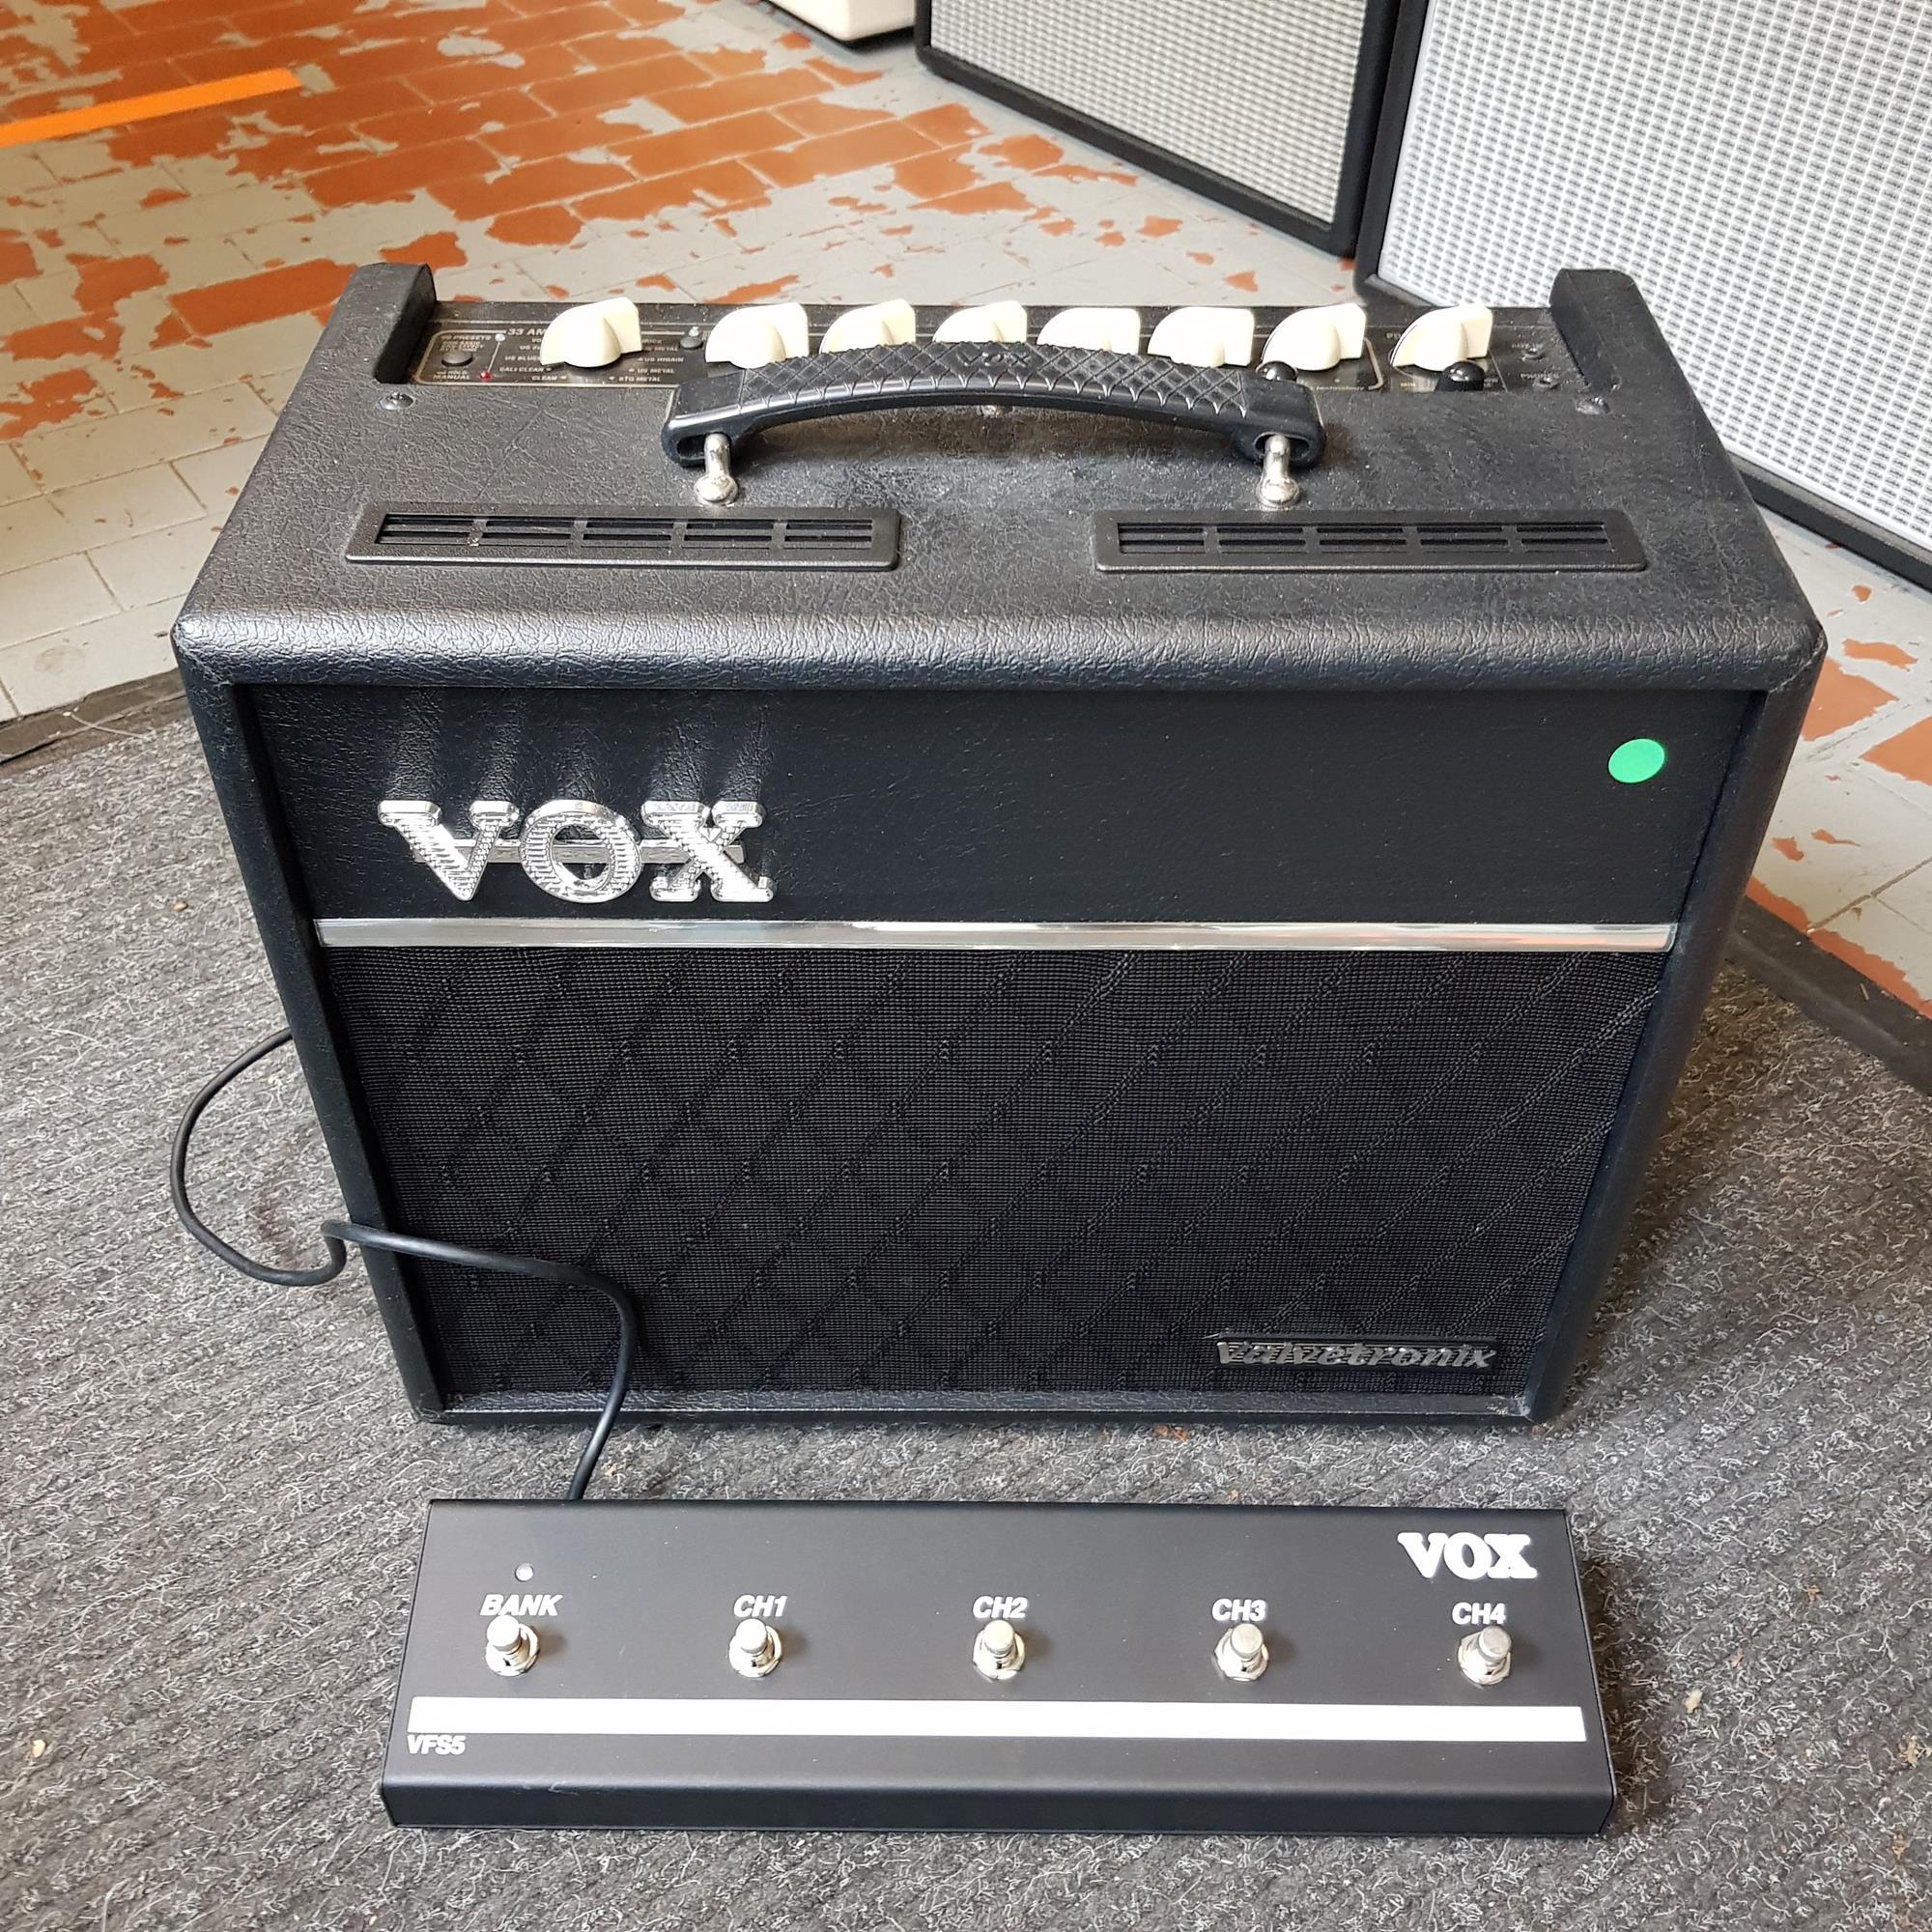 VOX-VT20-VFS-5-FOOTSWITCH-sku-1603549396421